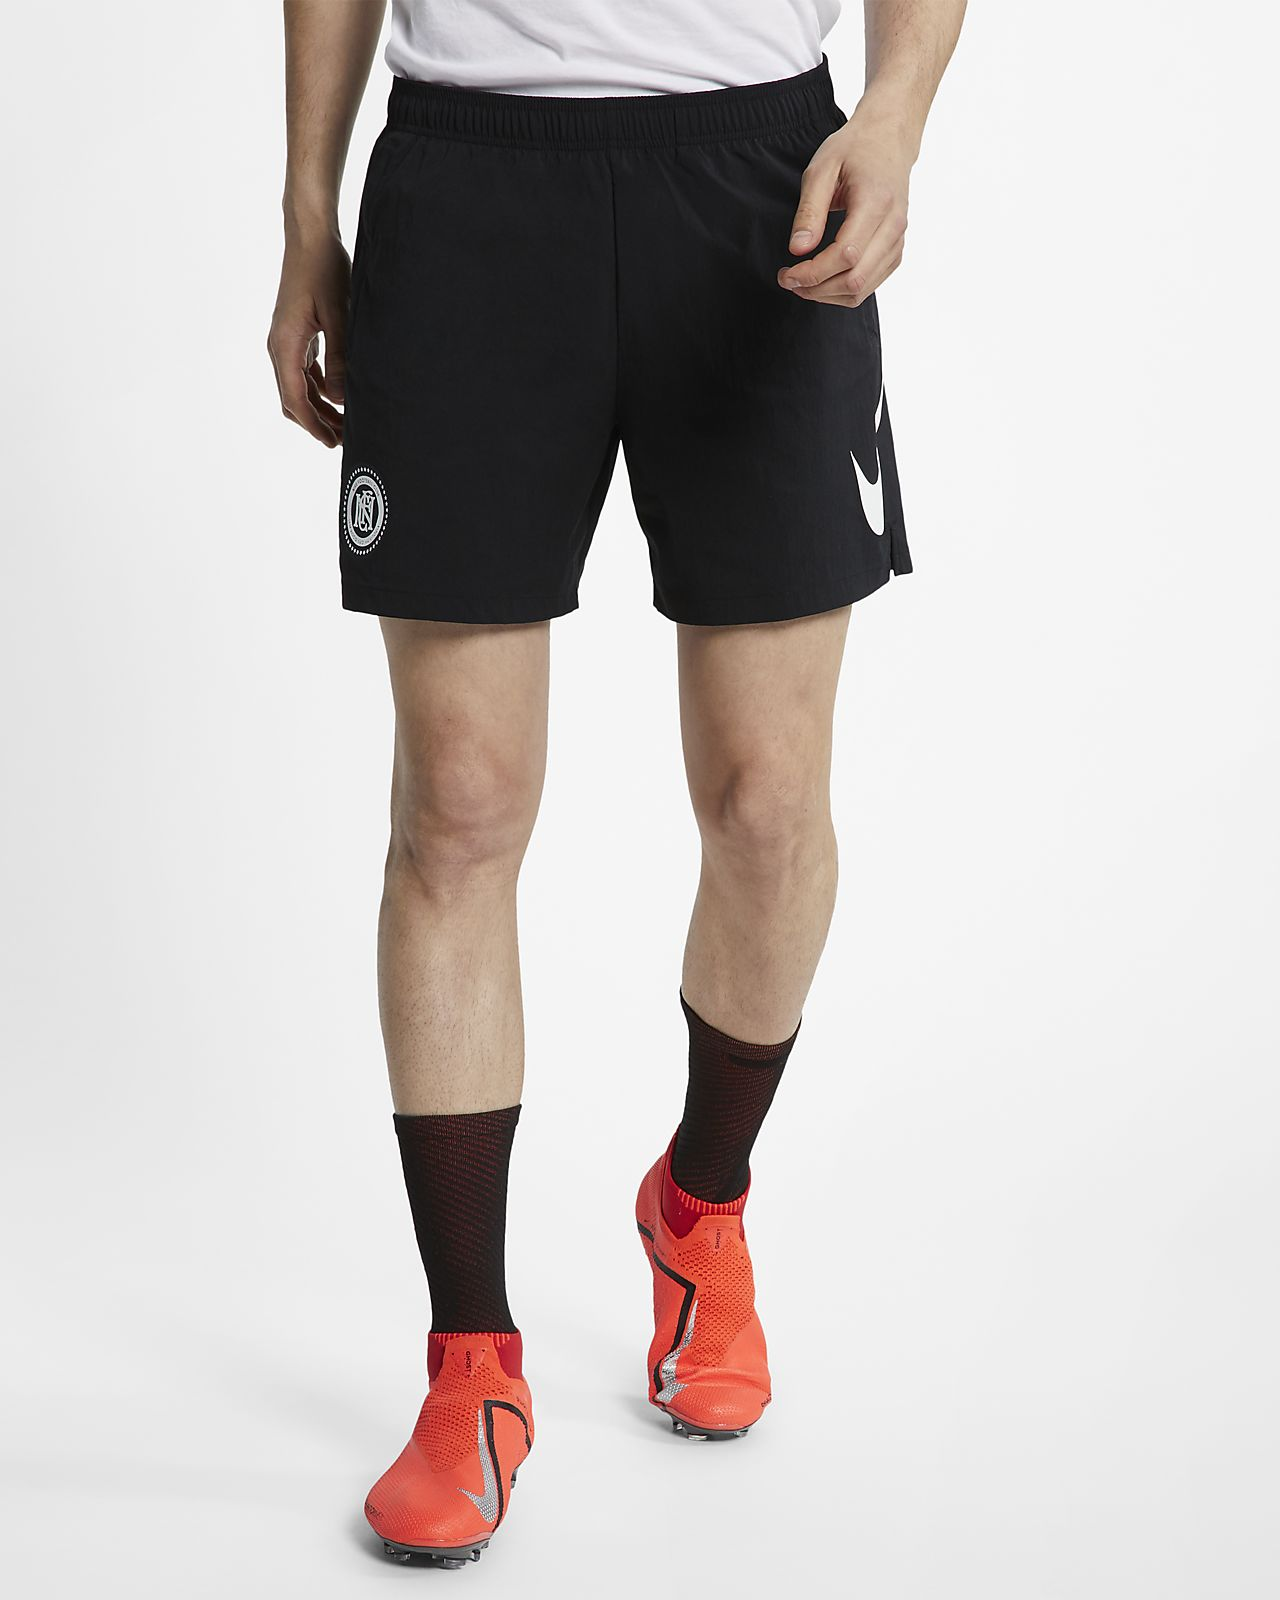 Shorts da calcio Nike F.C. - Uomo